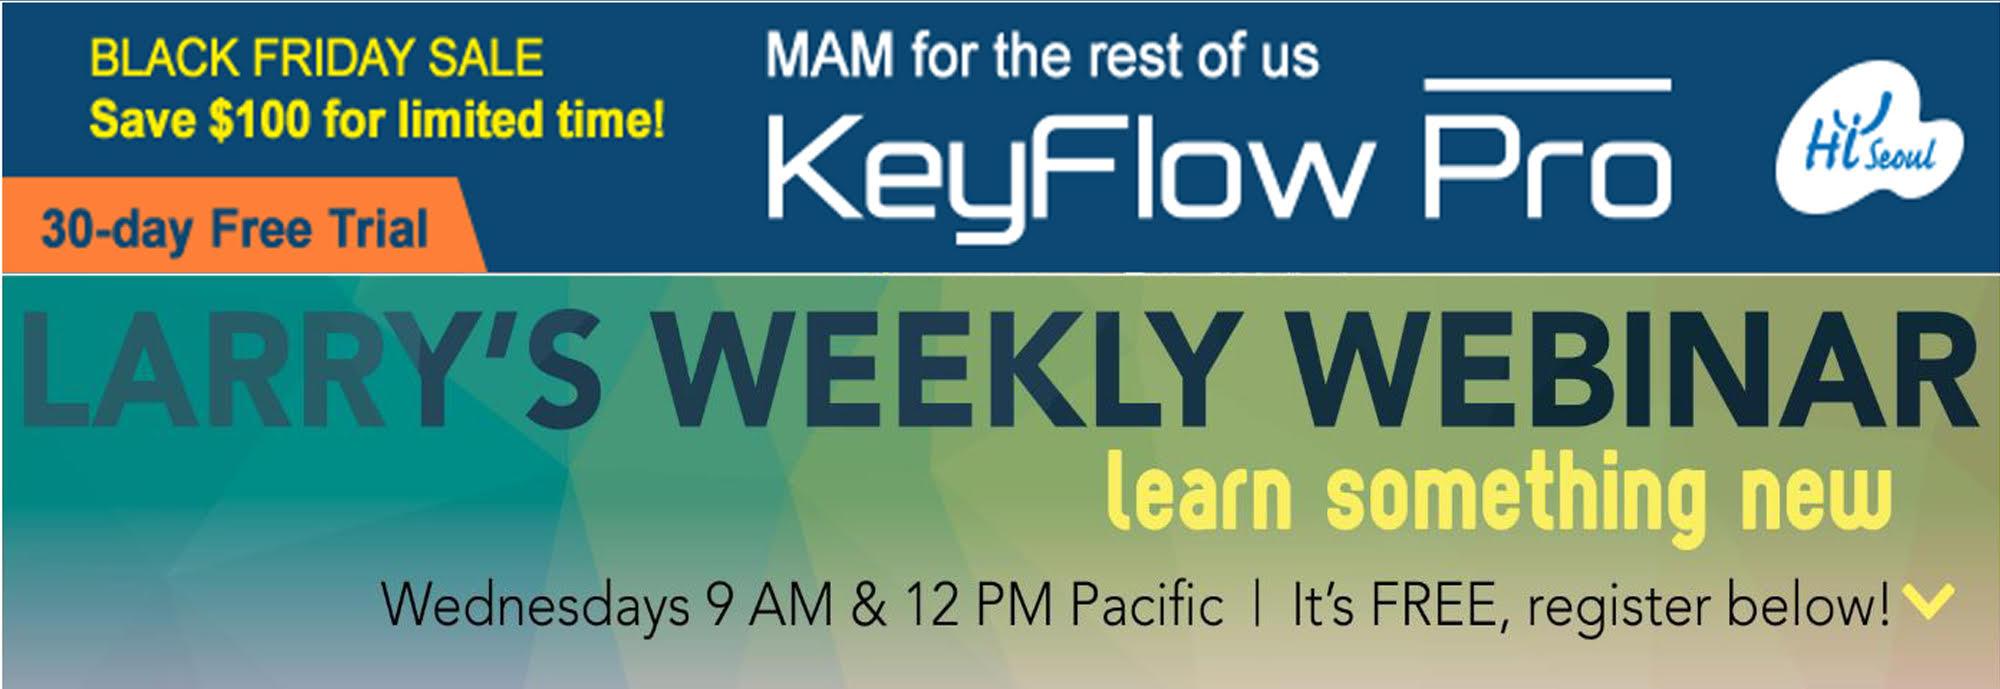 Key Flow Pro Black Friday Sale